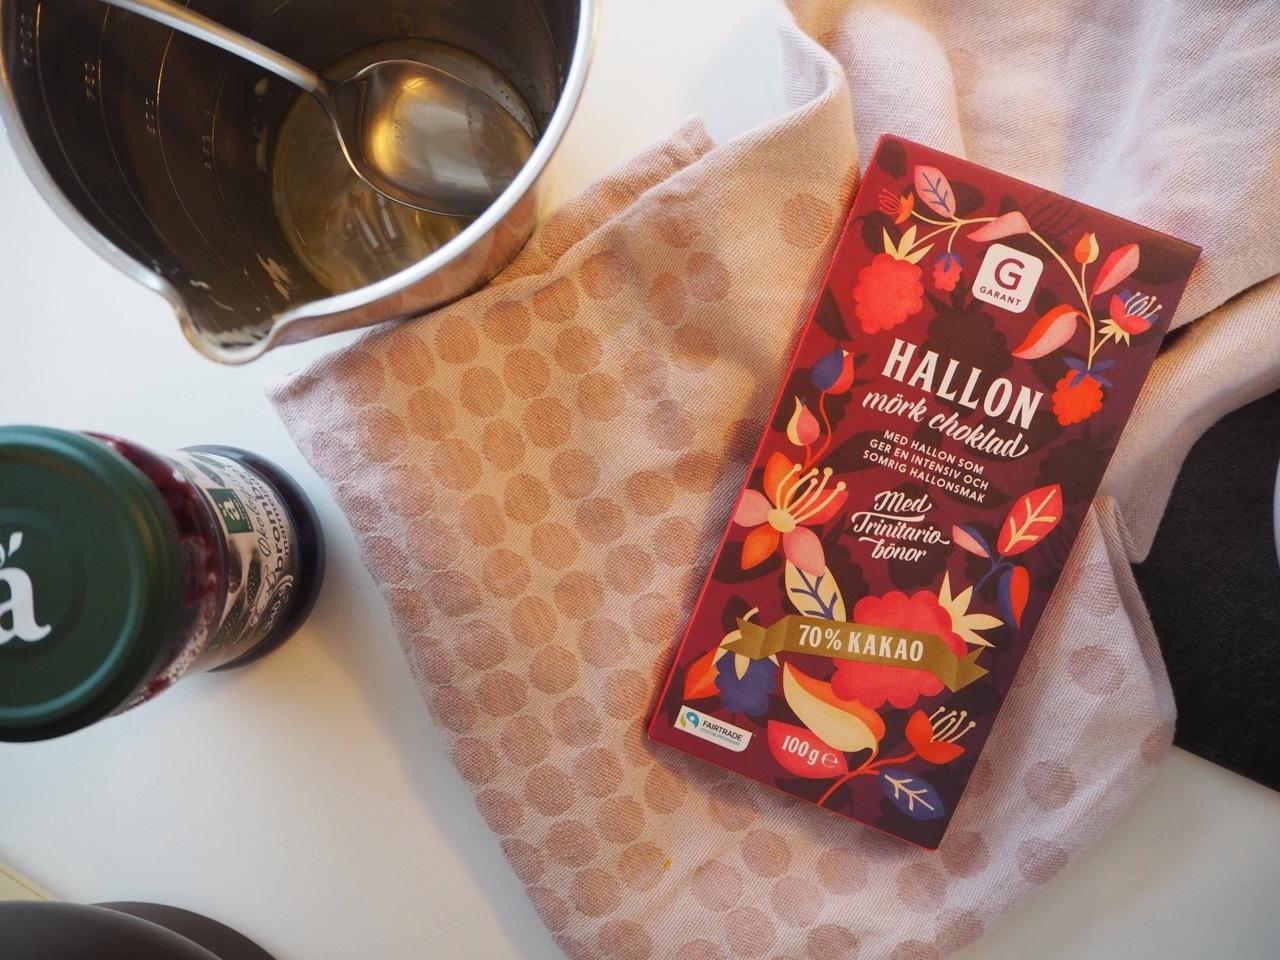 Svensk_chokolade_bagning